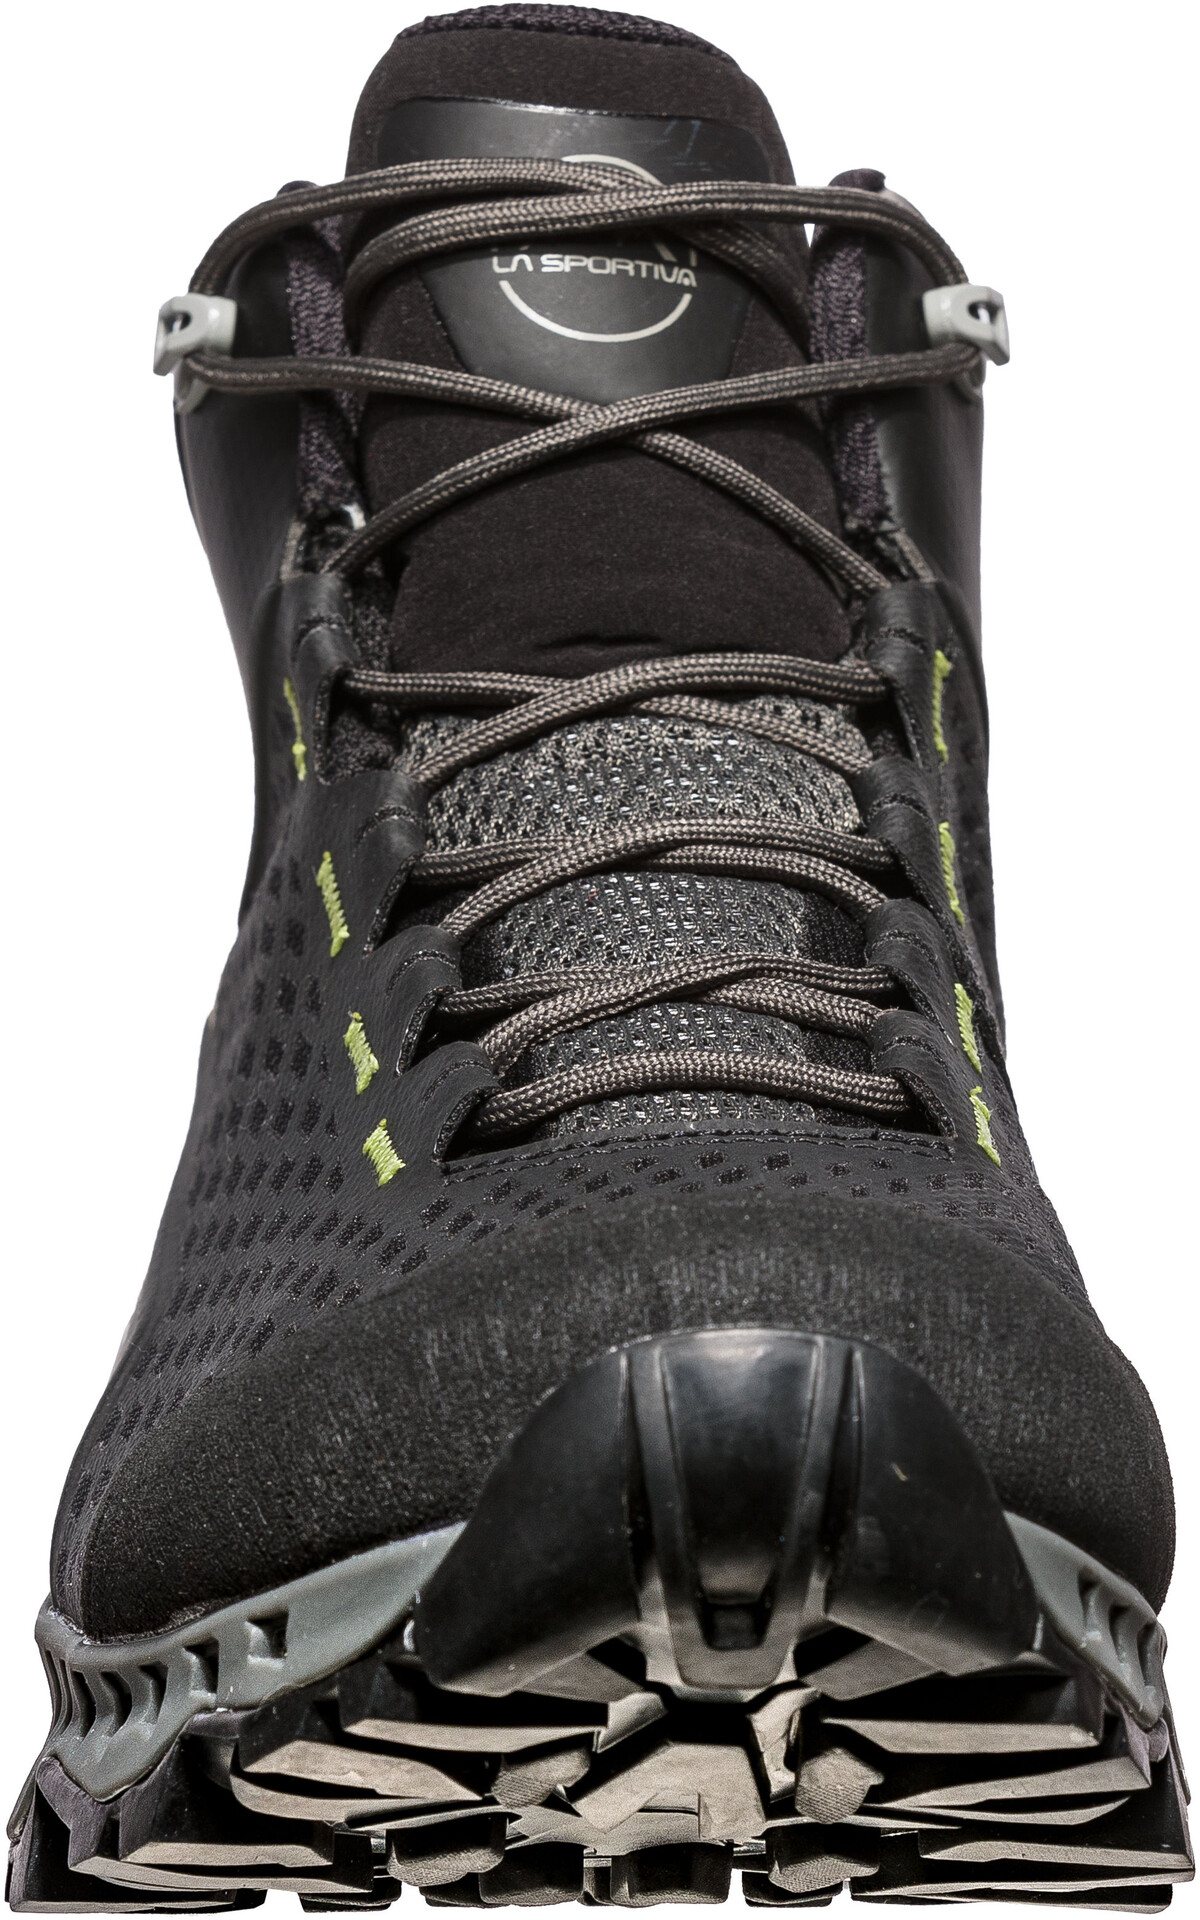 Sportiva Gtx Surround Shoes Stream Green Carbonapple Herren La YfgmIb7vy6